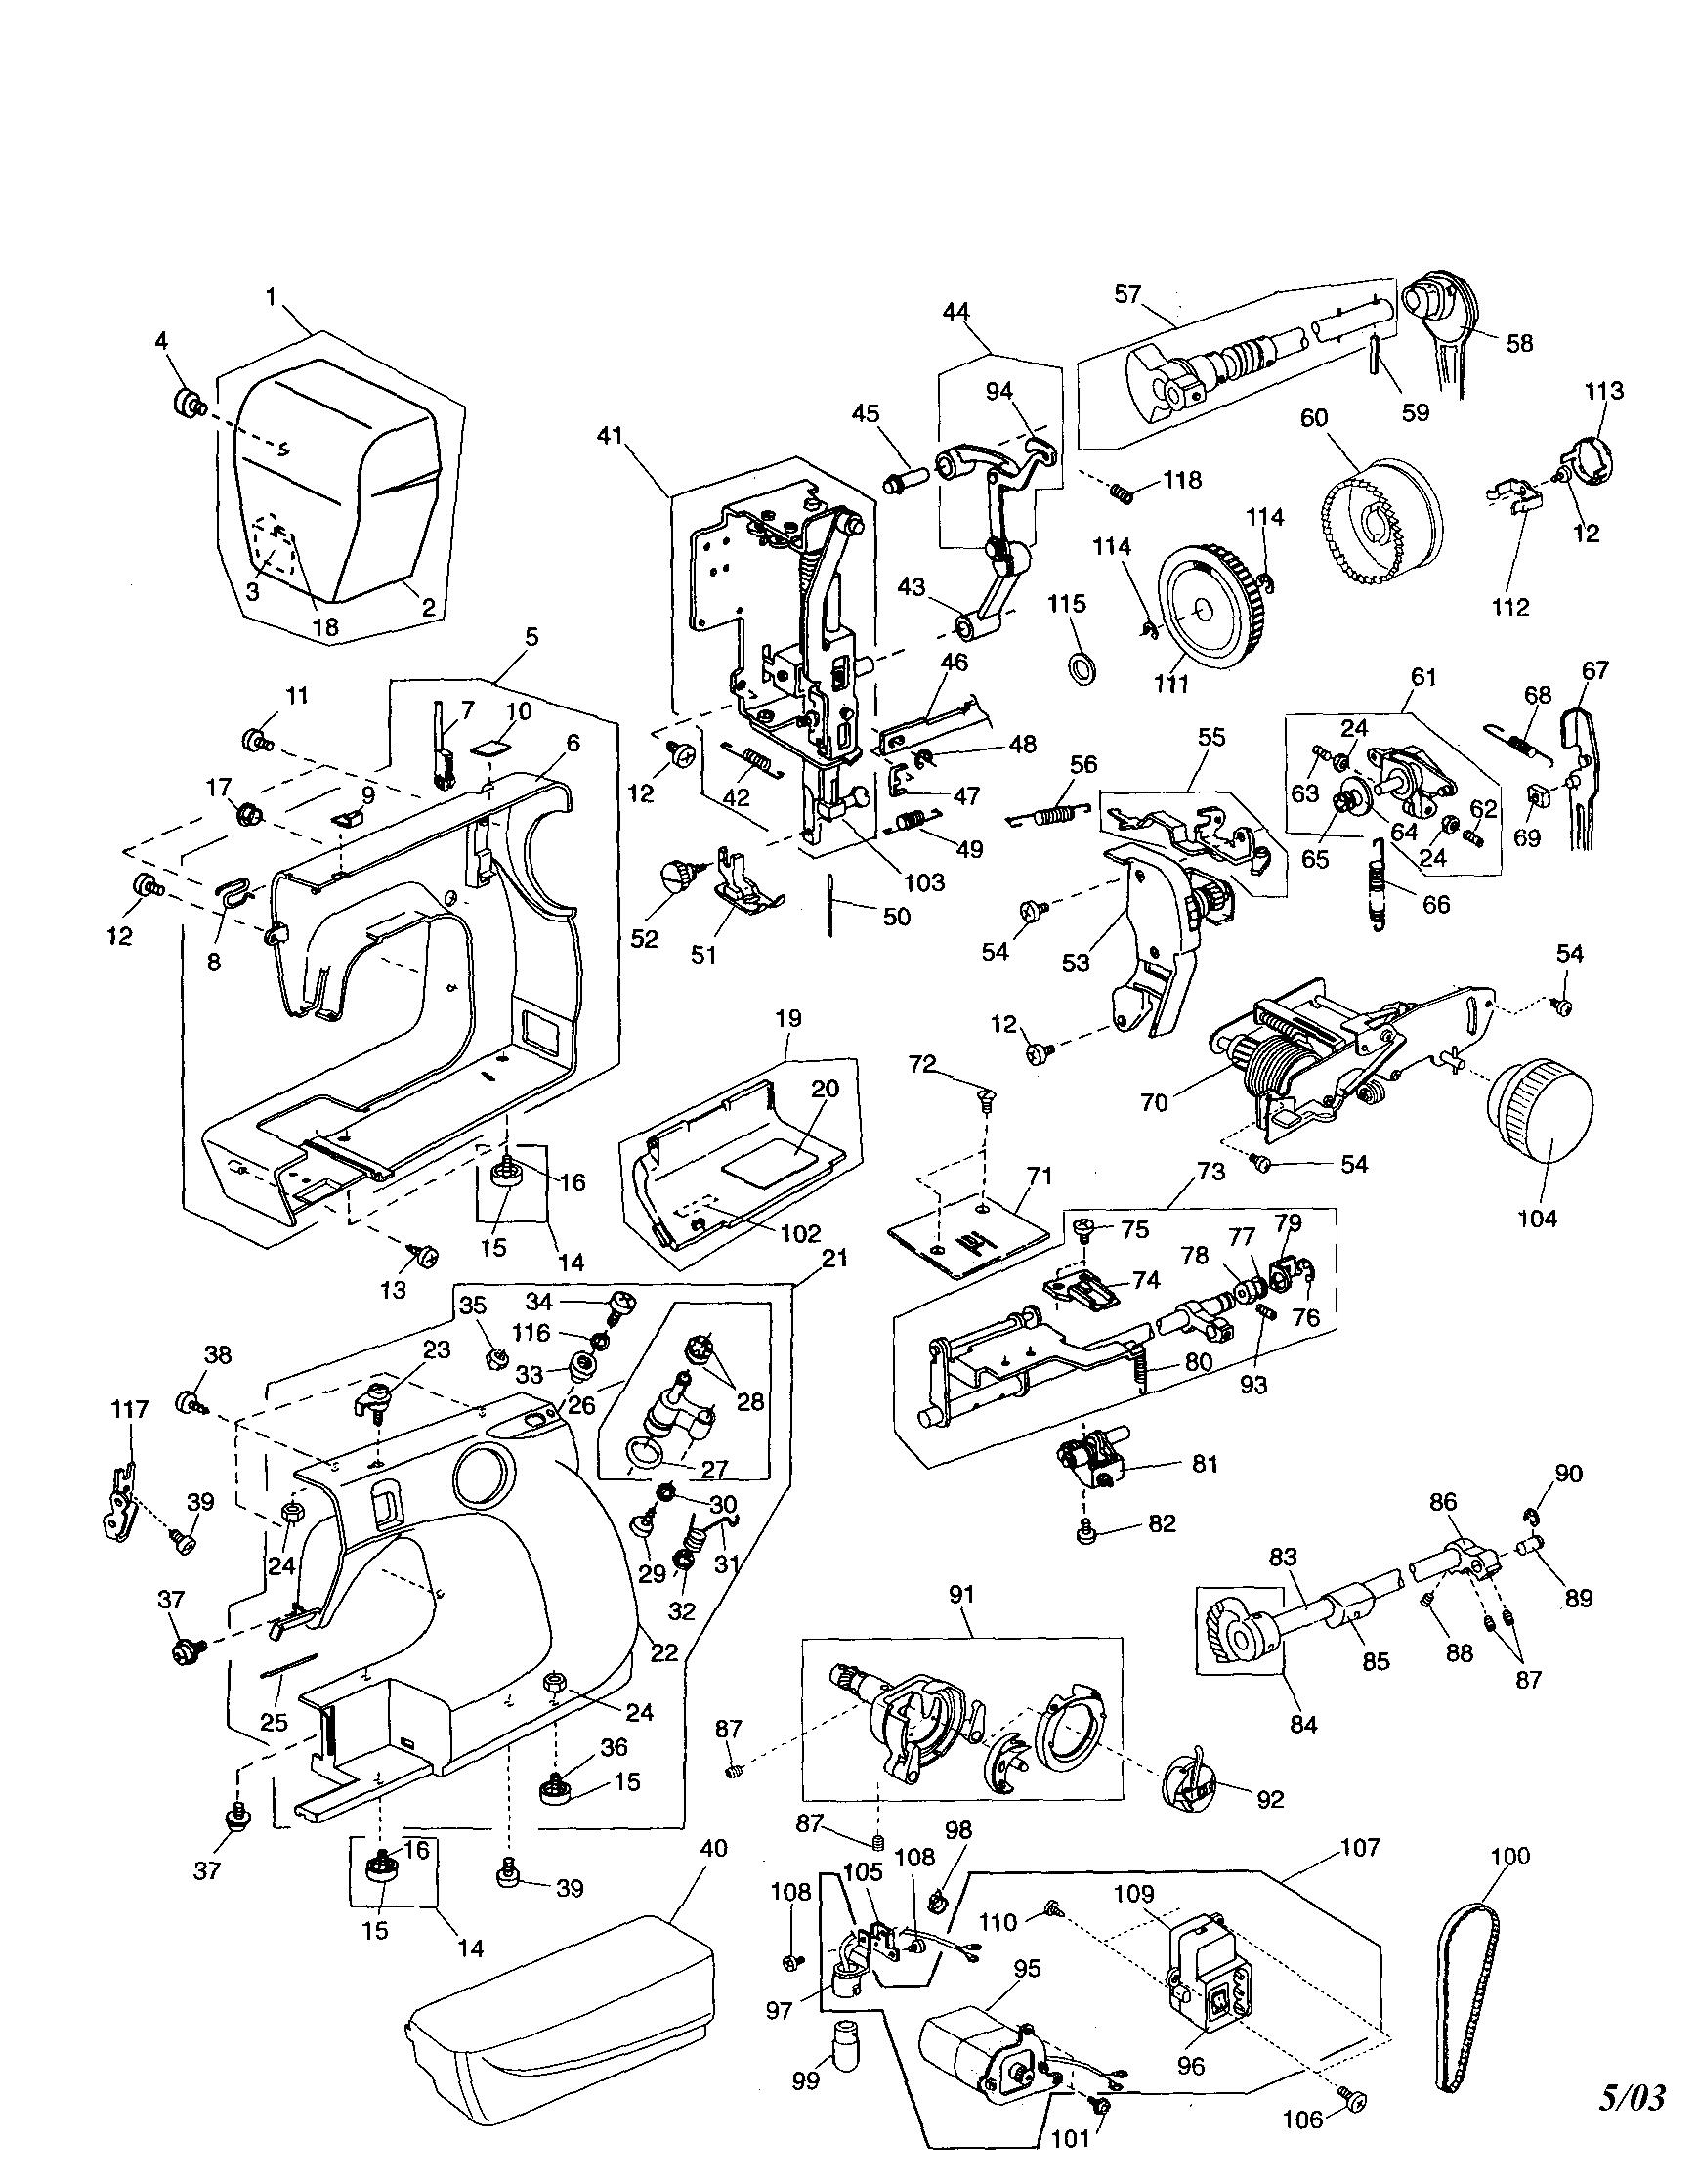 kenmore sewing machine model 38511206300 sewing machine parts diagram [ 1738 x 2235 Pixel ]